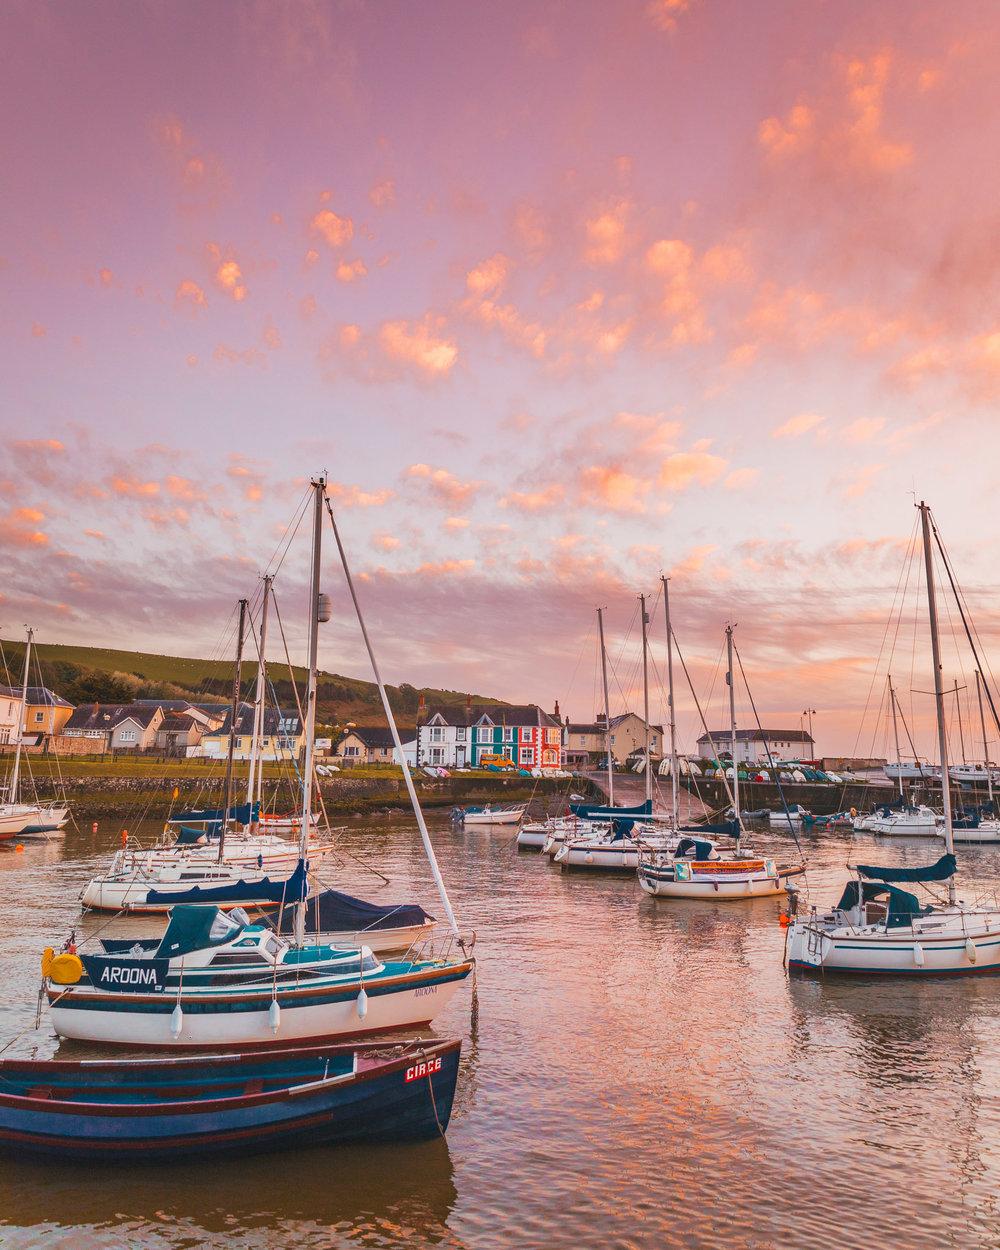 Aberaeron harbour sunset // The Most Beautiful Places to Visit in Wales // #readysetjetset #wales #uk #welsh #travel #photospots #blogpost